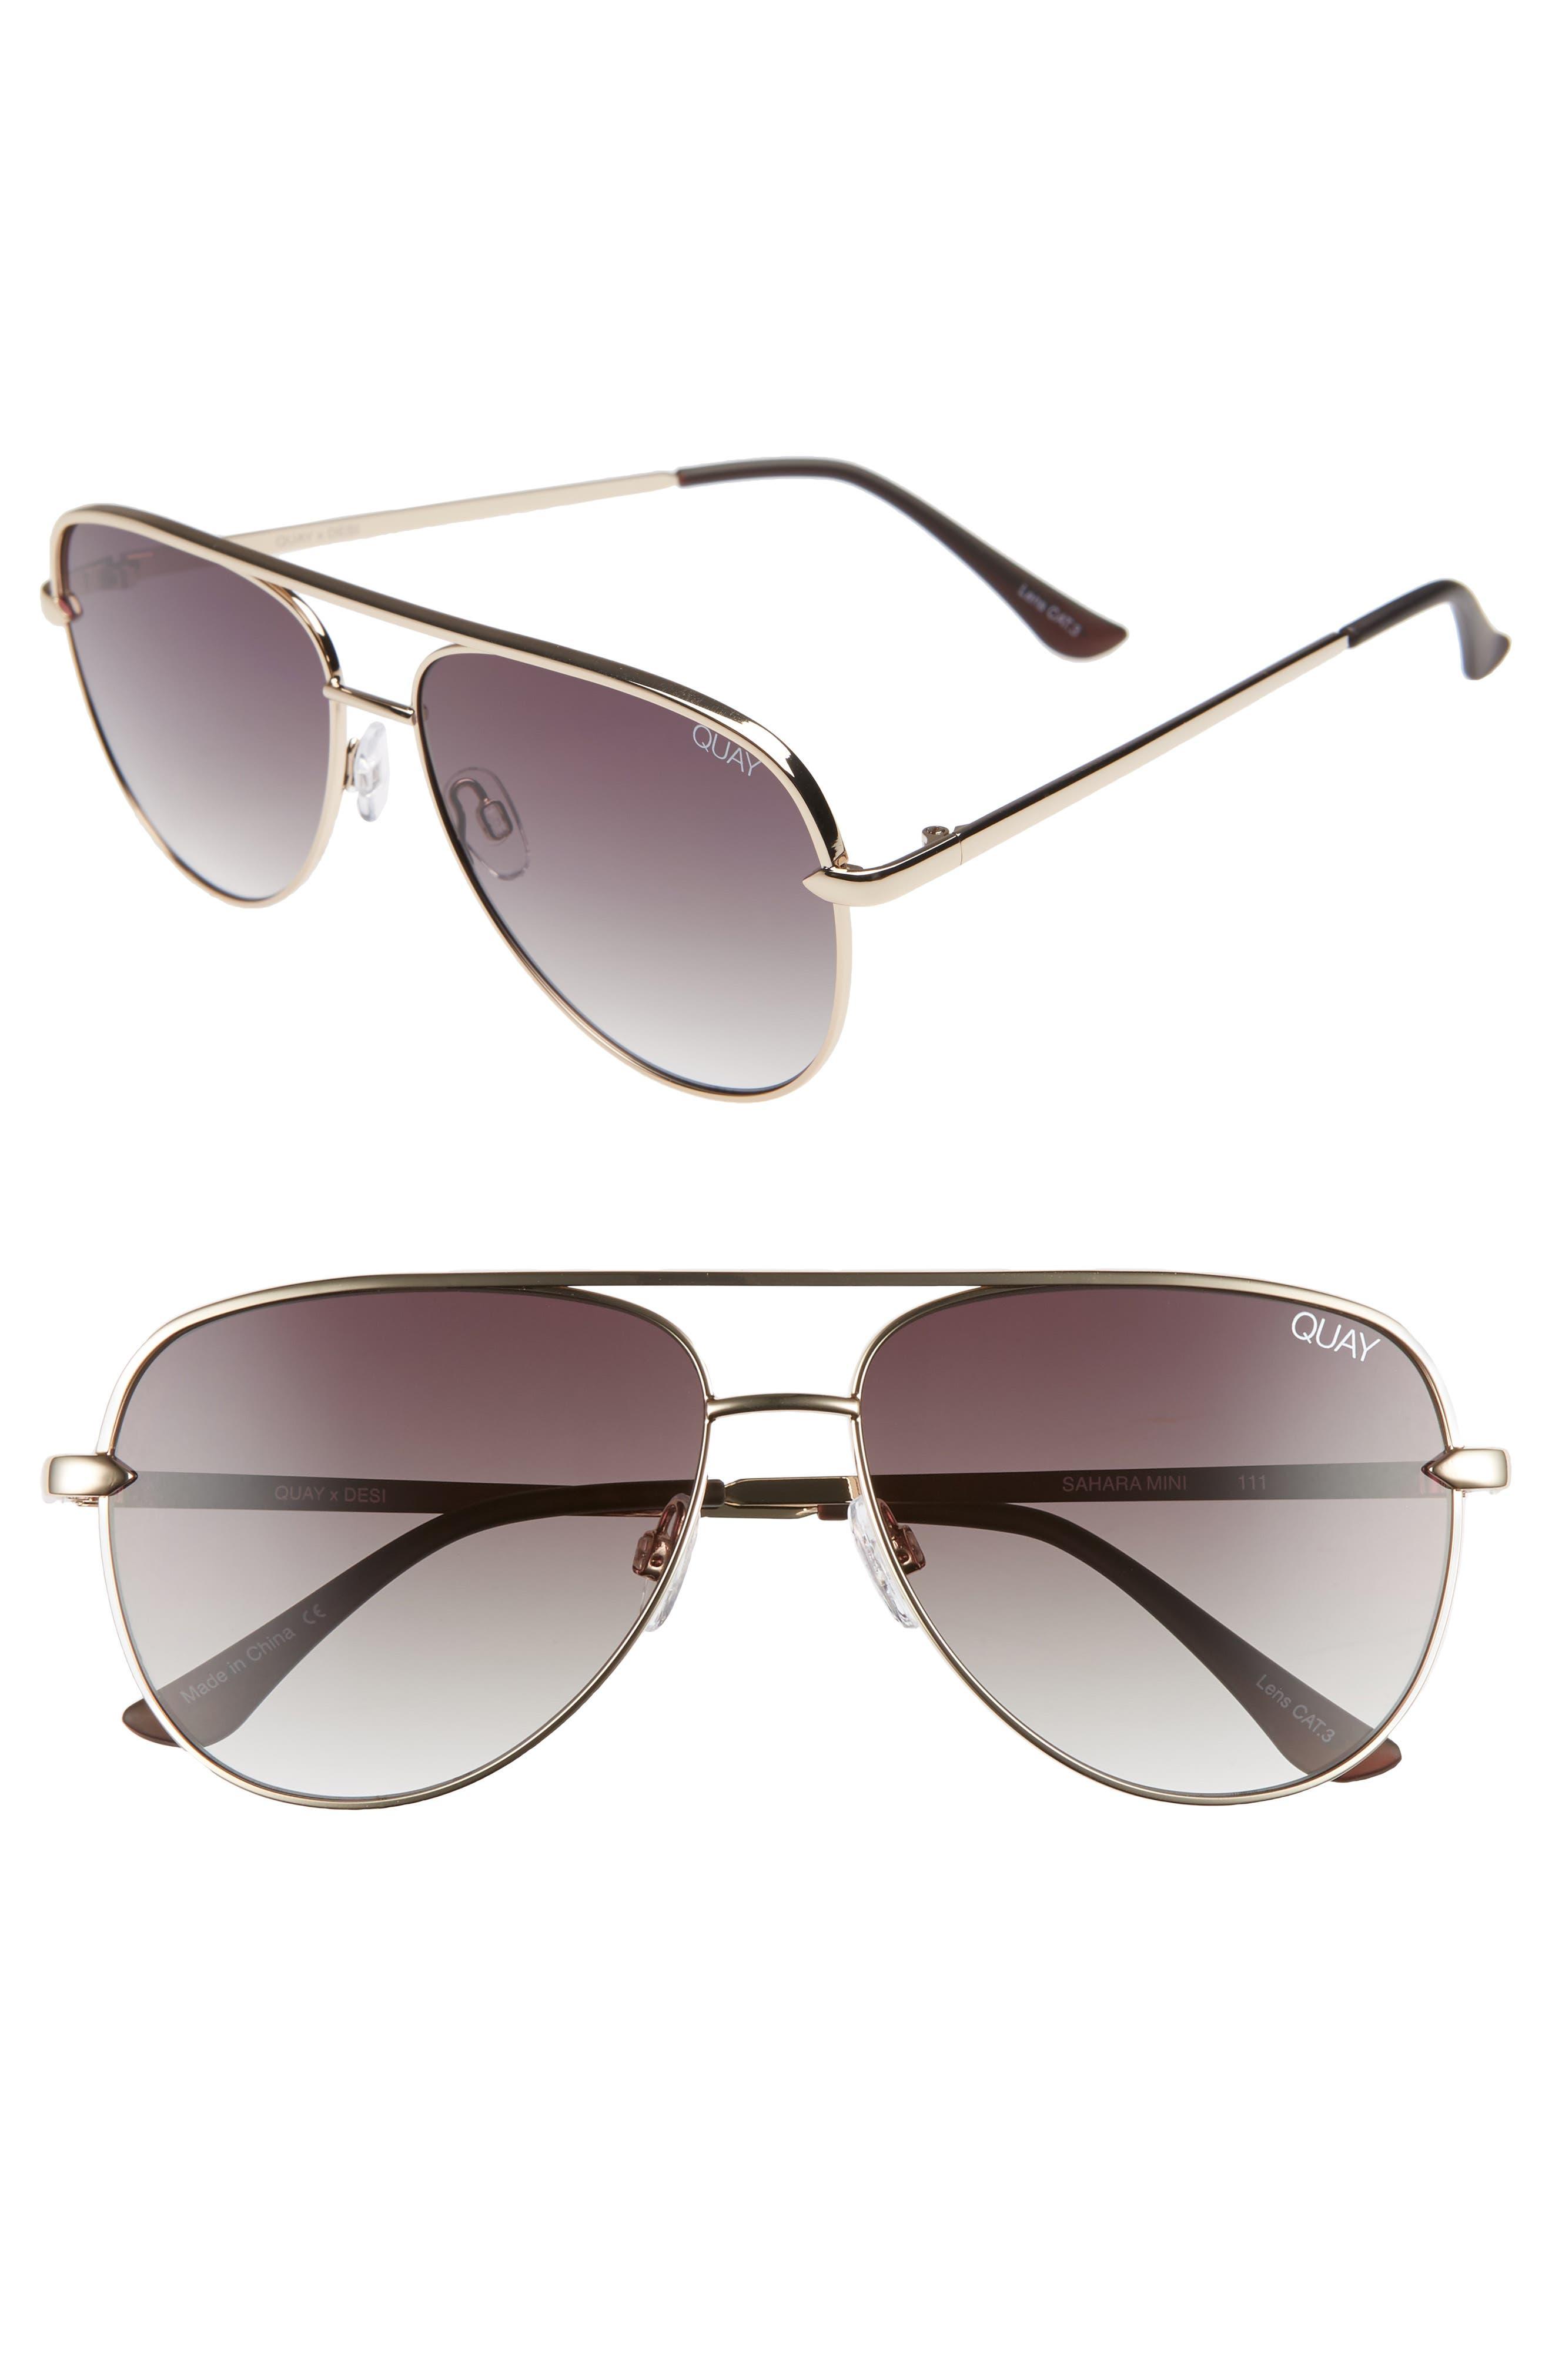 QUAY X Desi Perkins Sahara Mini 52Mm Aviator Sunglasses - Gold/ Smoke Taupe